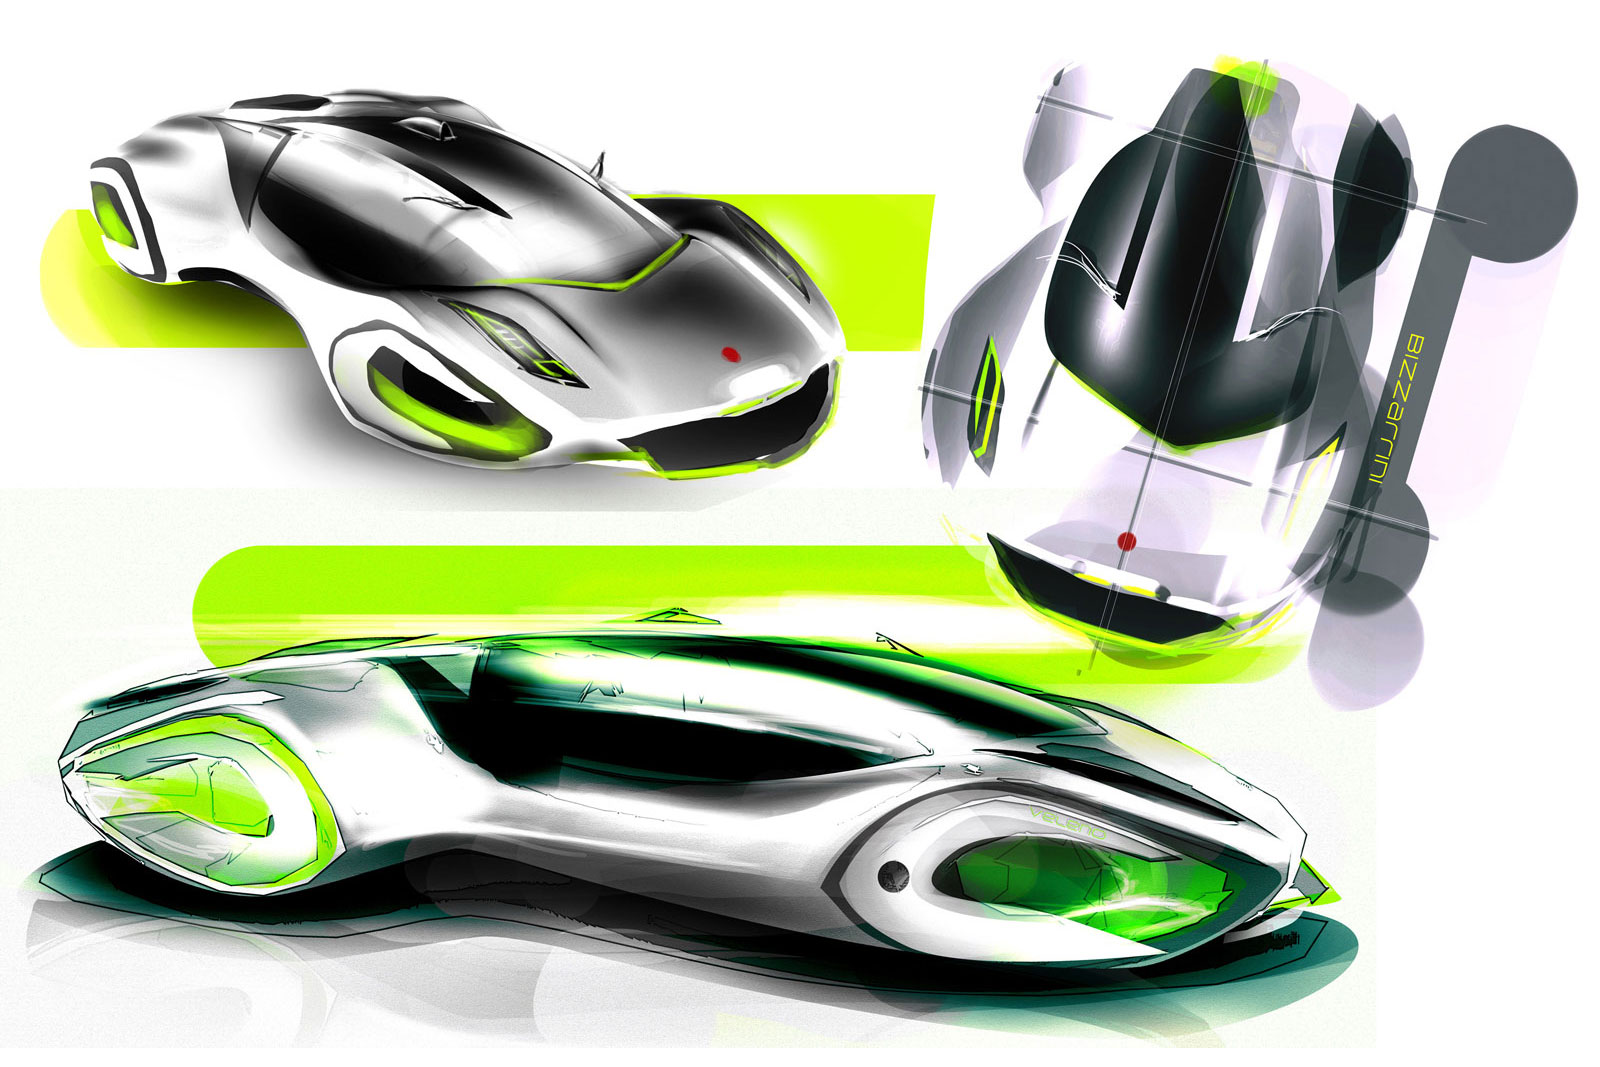 Bizzarrini-Veleno-Concept-Design-Sketches-02